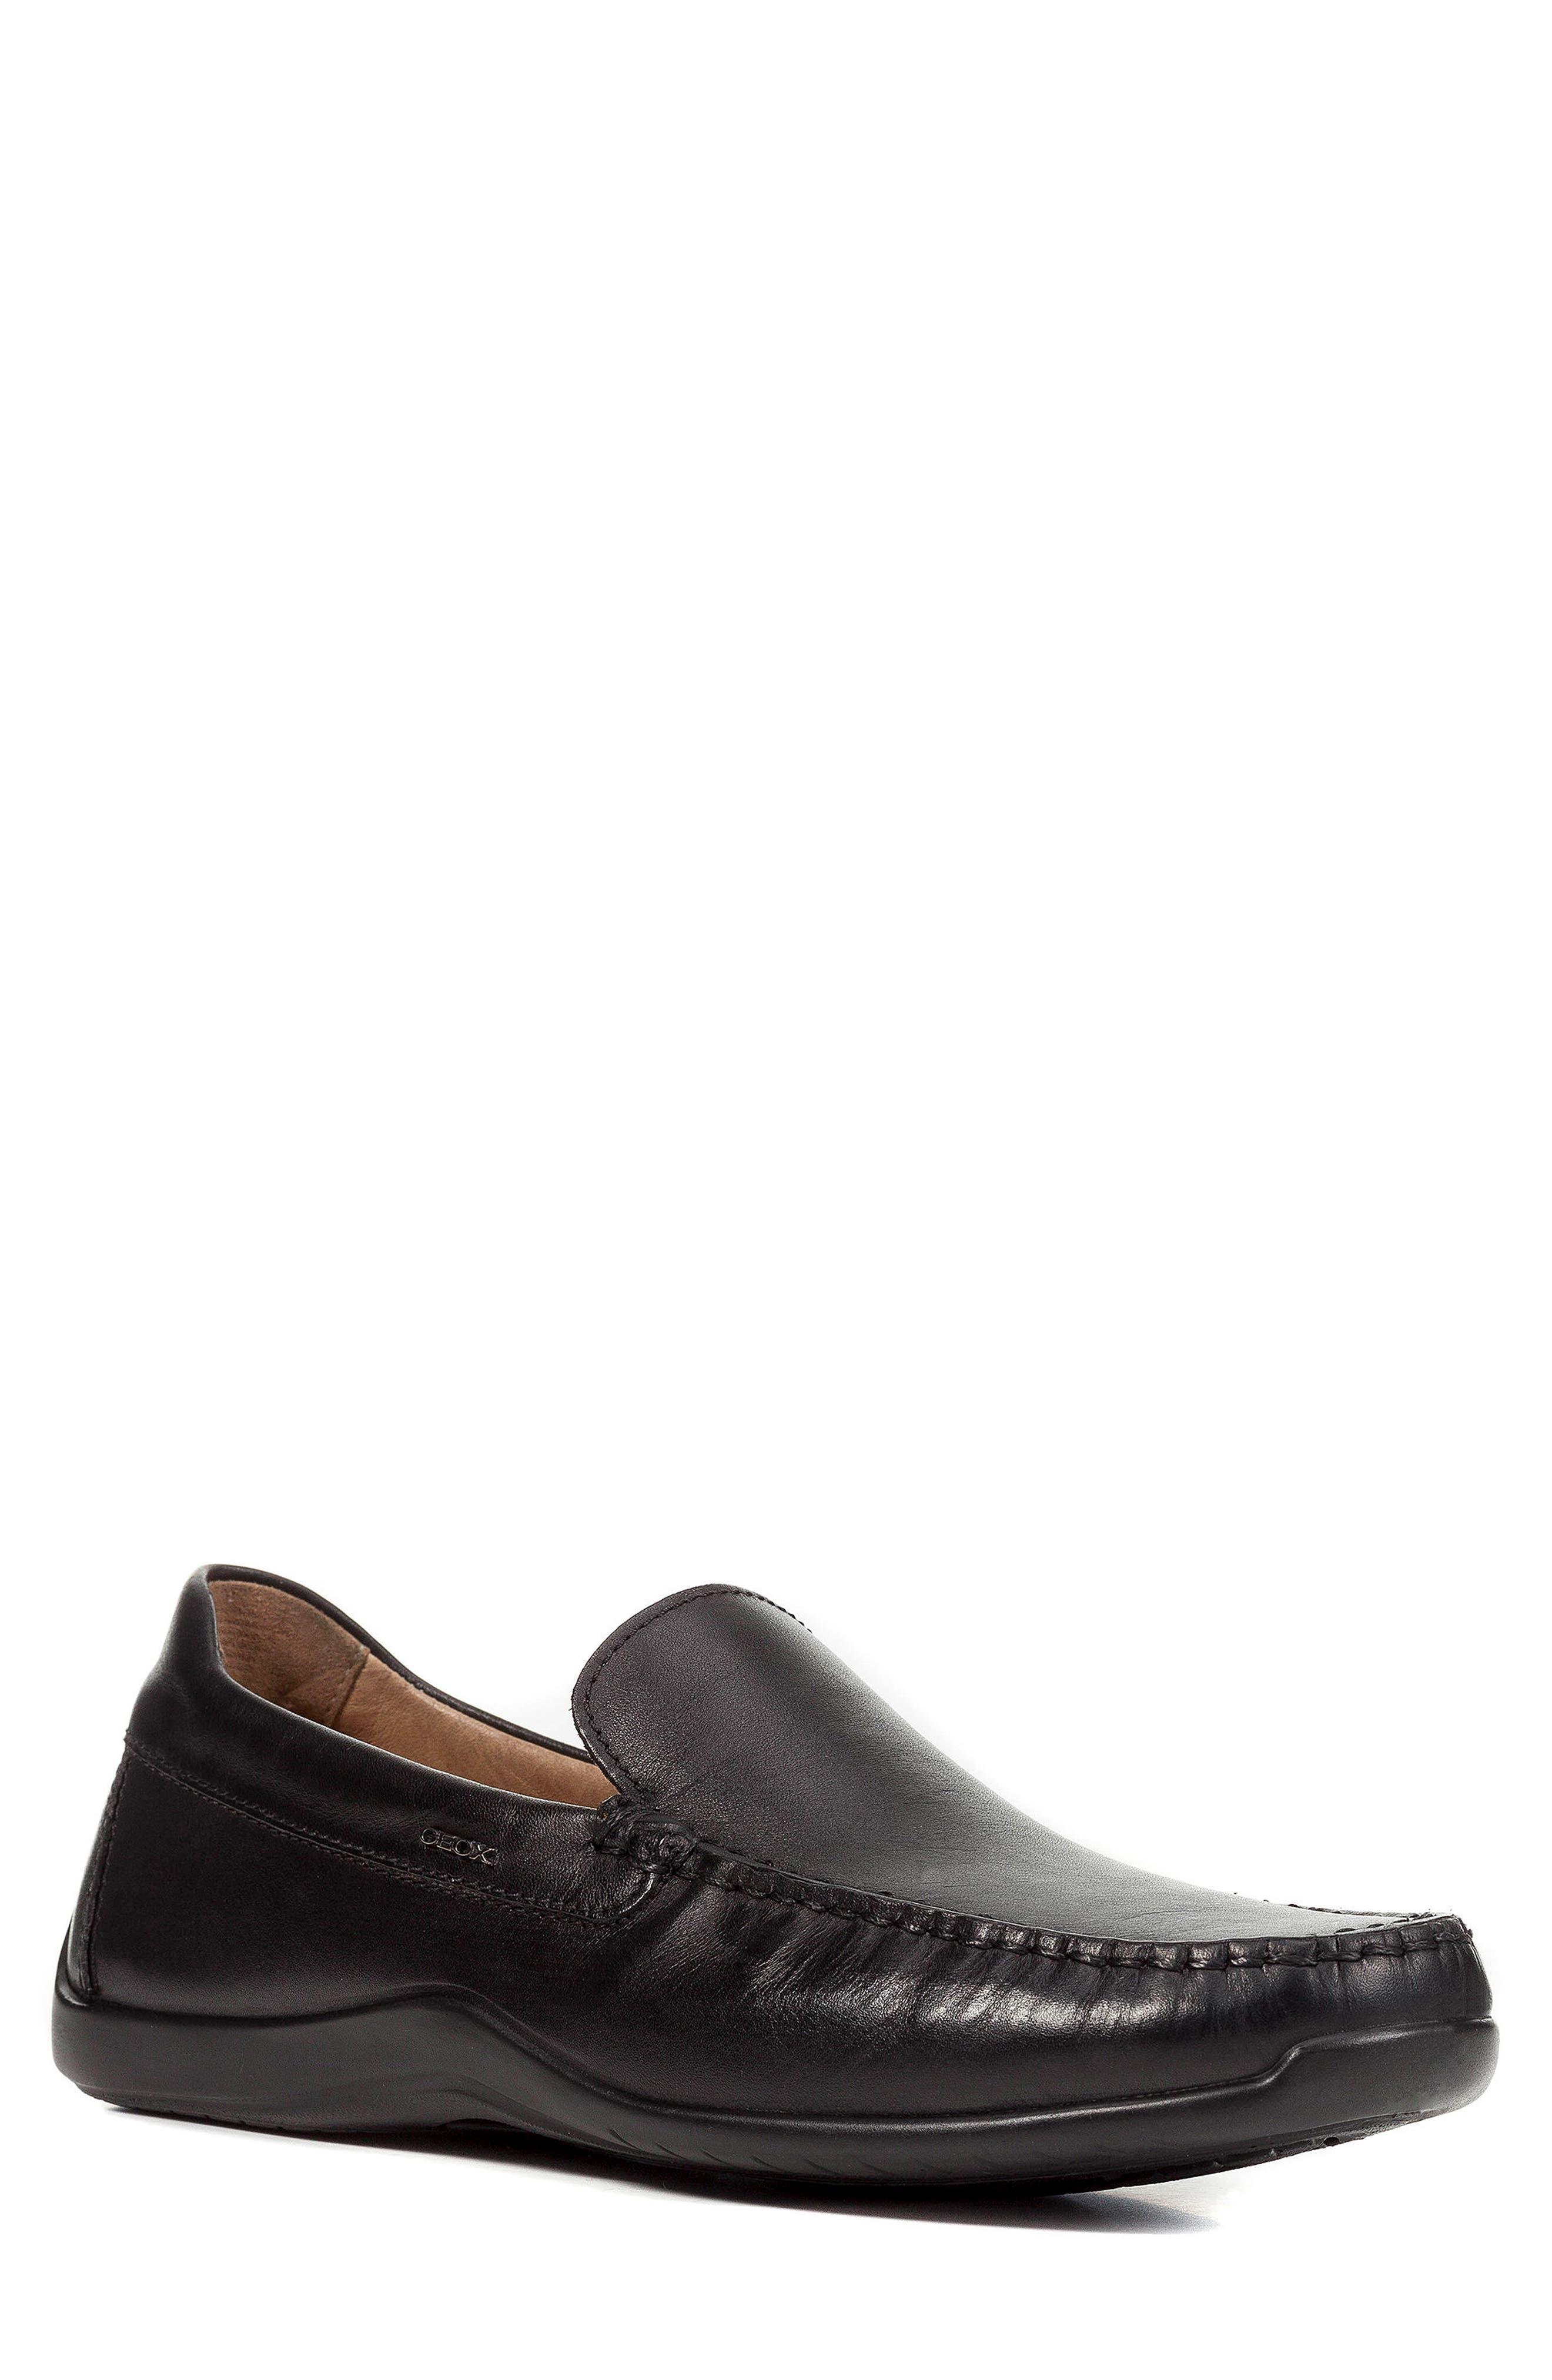 'U Xense Mox' Driving Shoe,                         Main,                         color, Black Leather